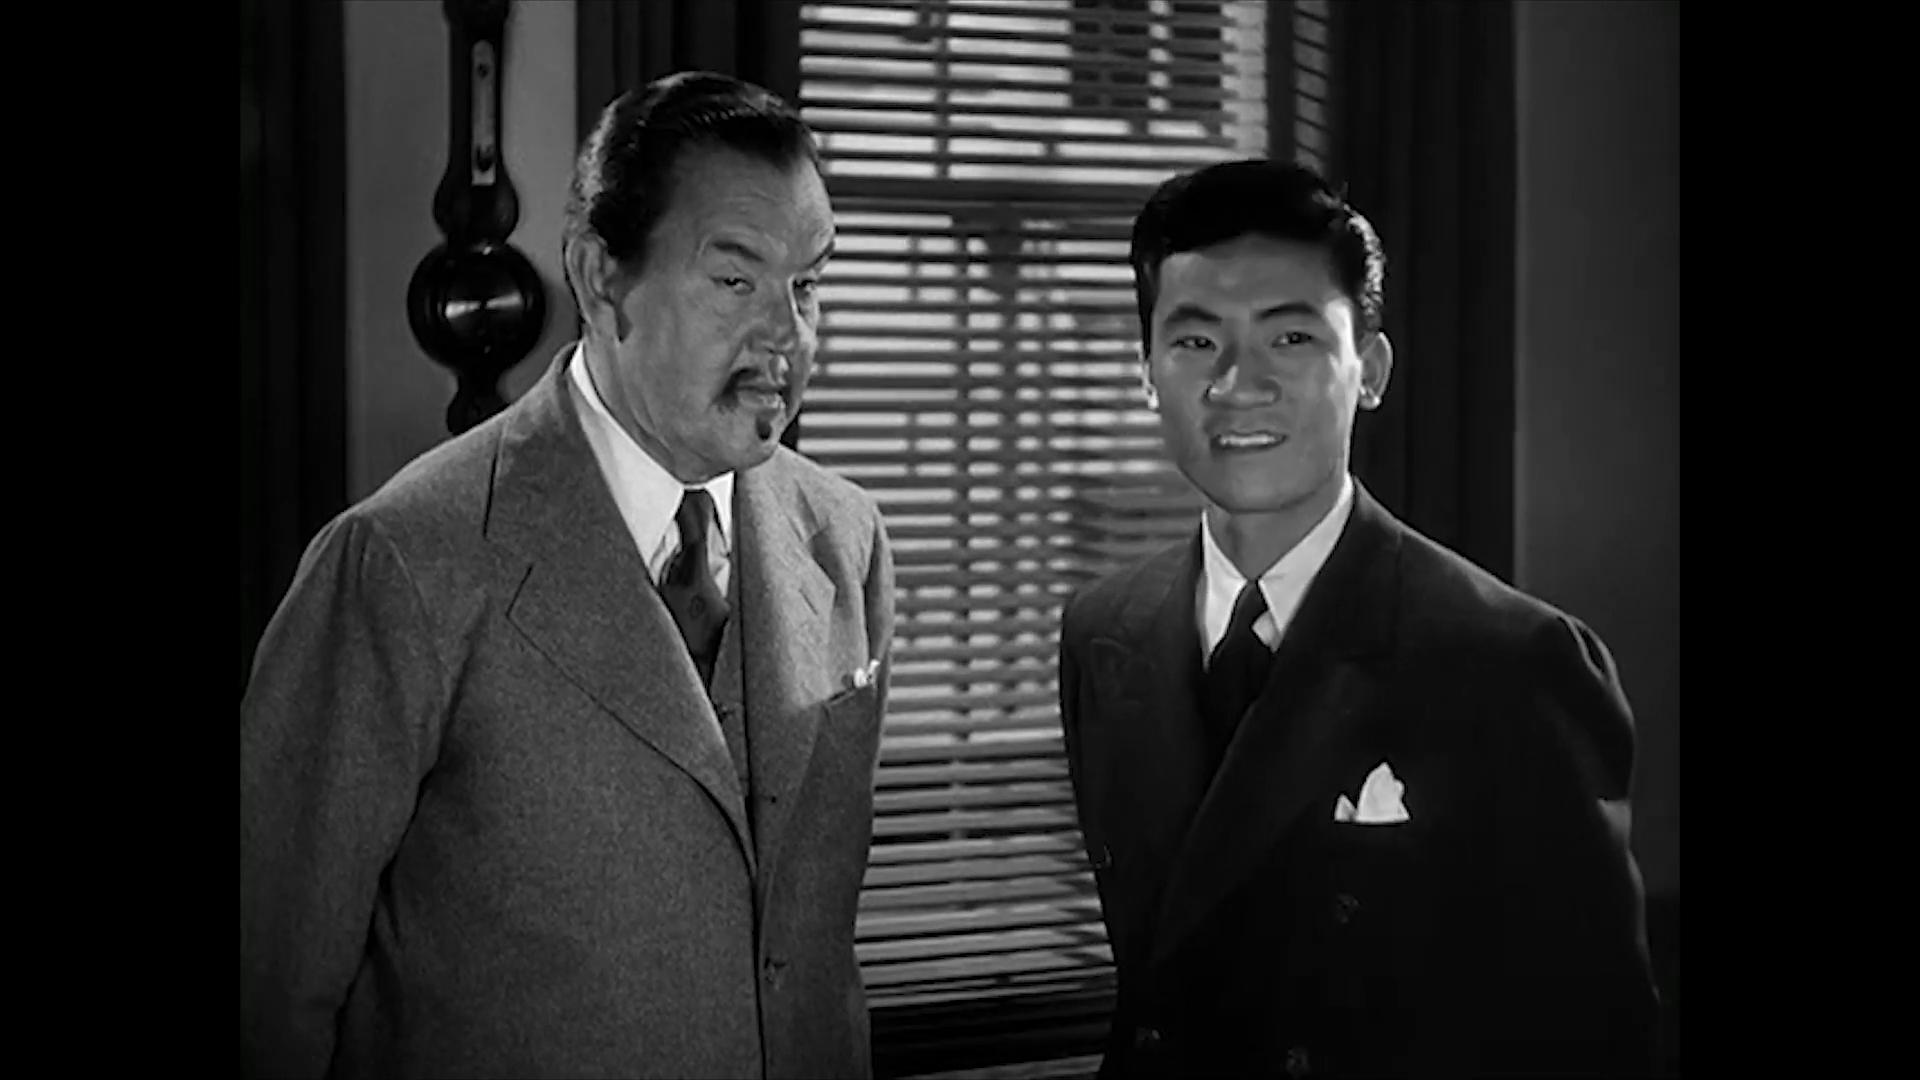 Sidney Toler et Sen Yung dans Charlie Chan at the Wax museum (1940) de Lynn Shores